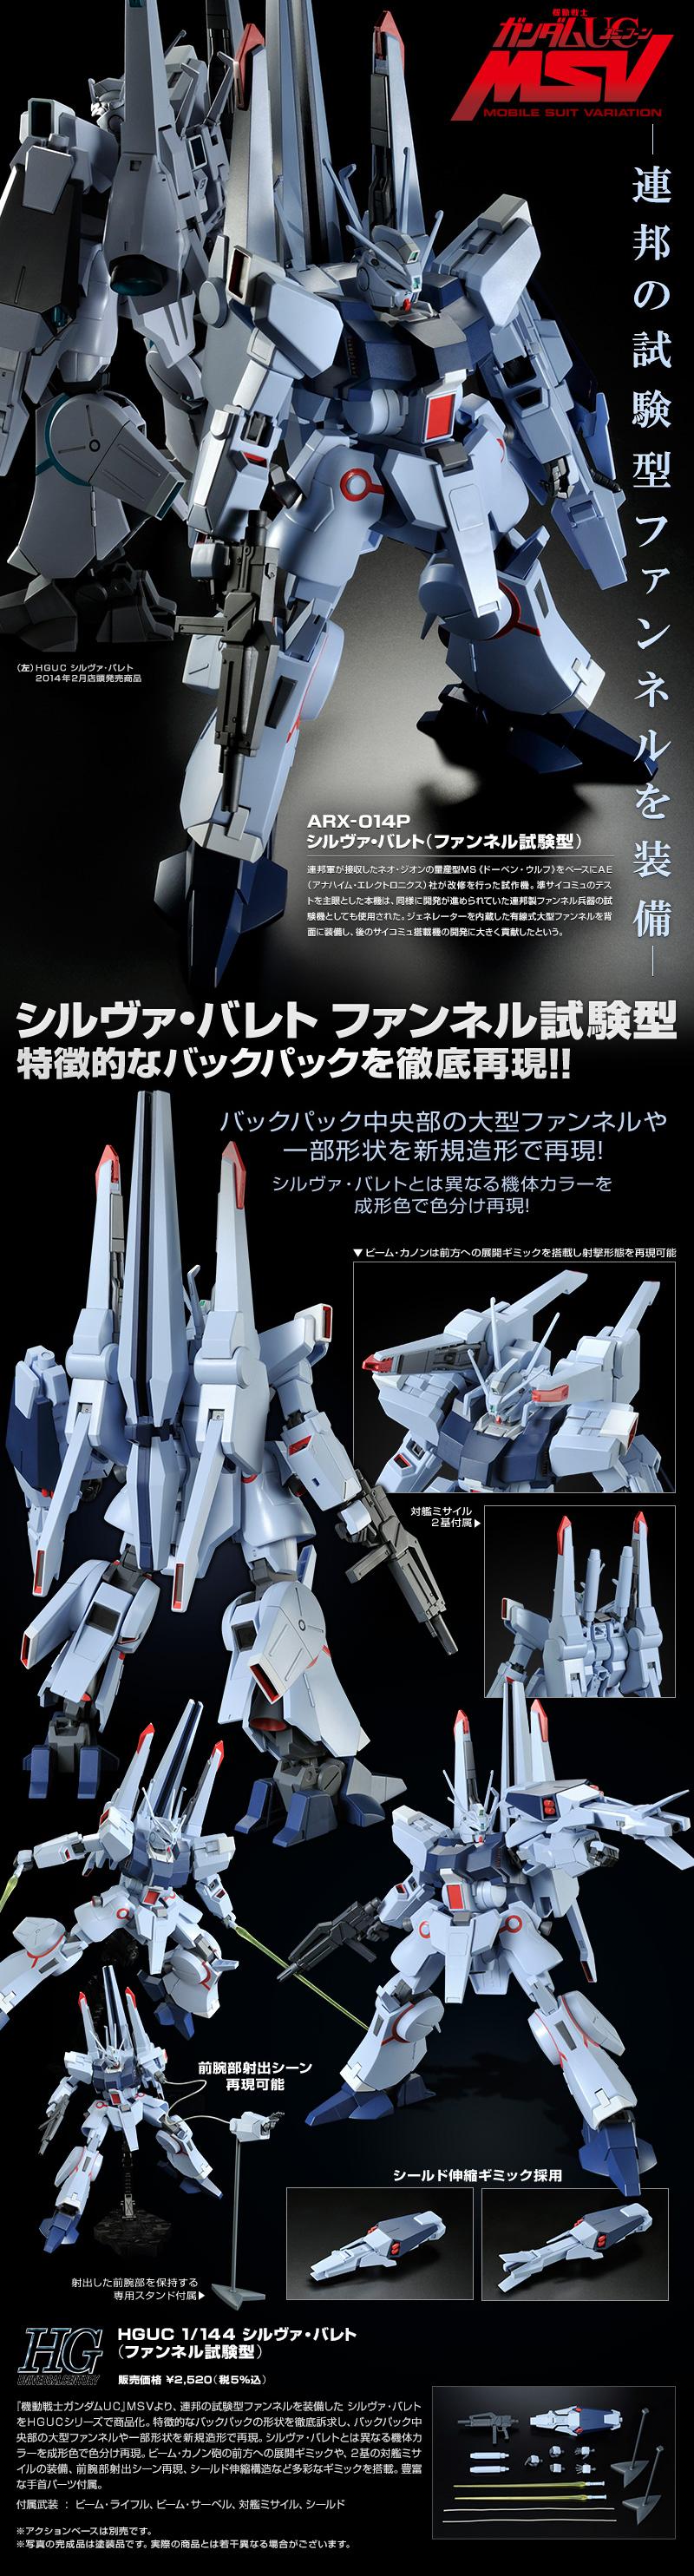 HGUC 1/144 ARX-014P シルヴァ・バレト(ファンネル試験型) [Silver Bullet (Funnel Test Type)] 公式商品説明(画像)